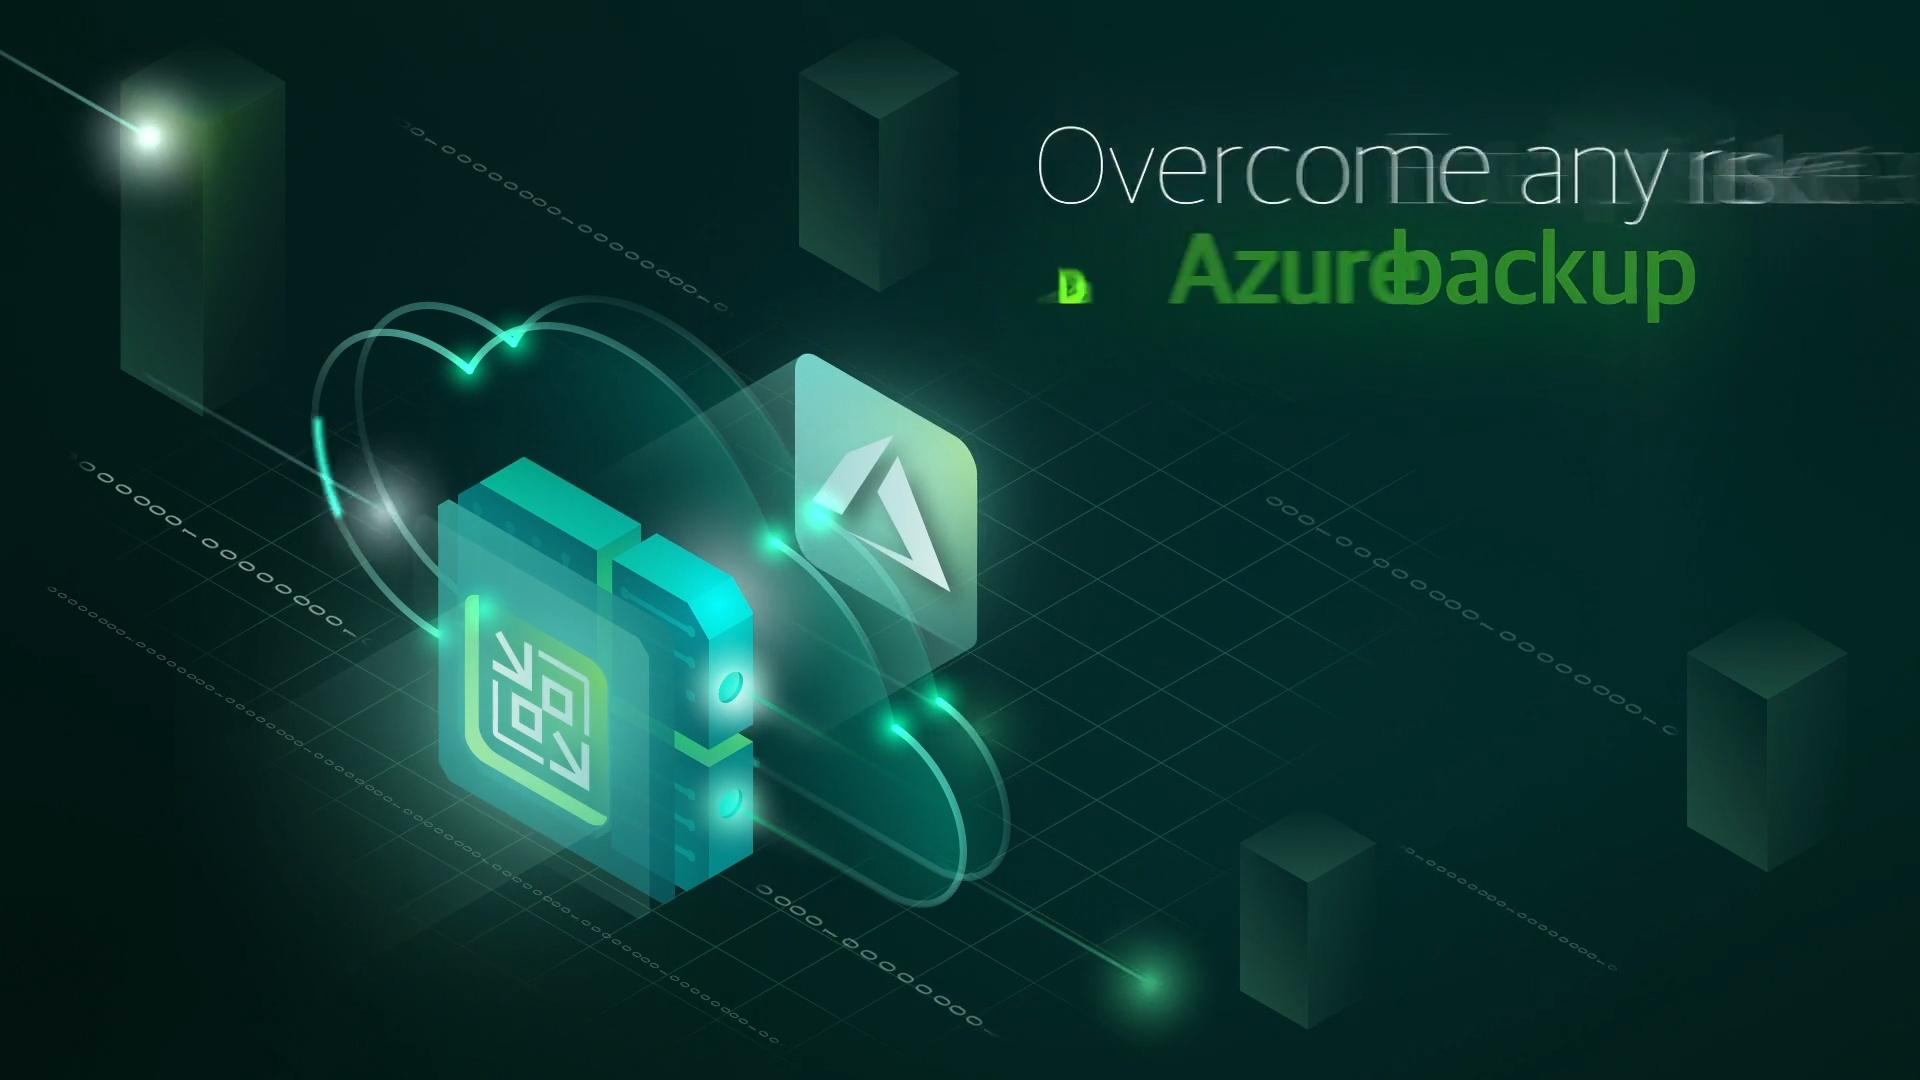 Product Launch: VBAzure v1 - Overview Video - VBAzure Overview Video - EN